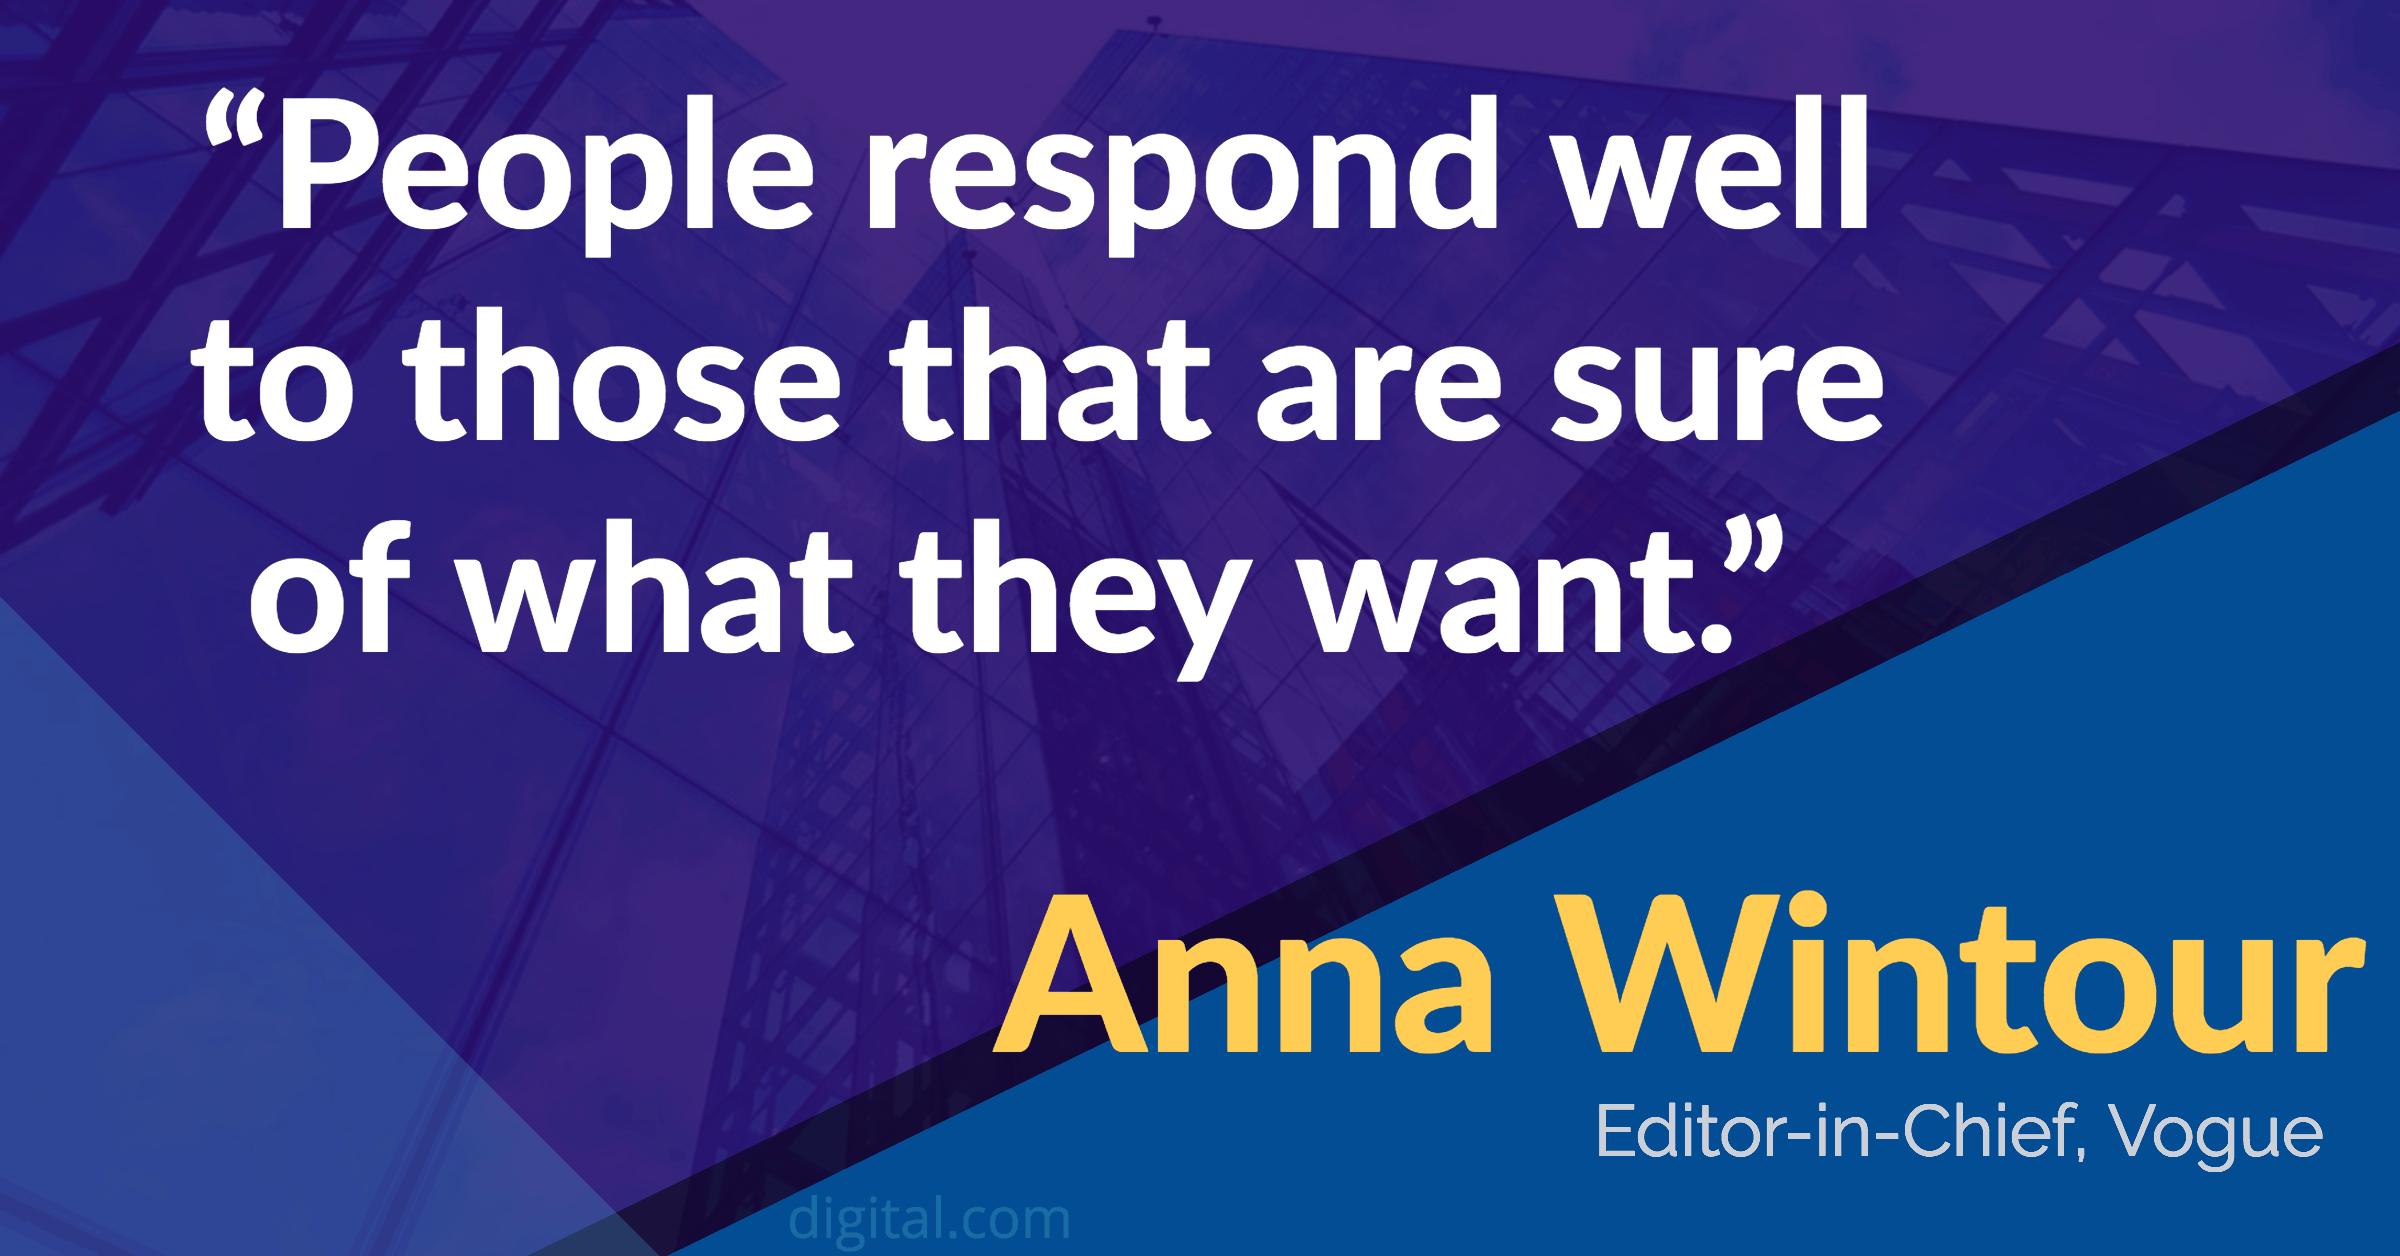 anna wintour leadership quote